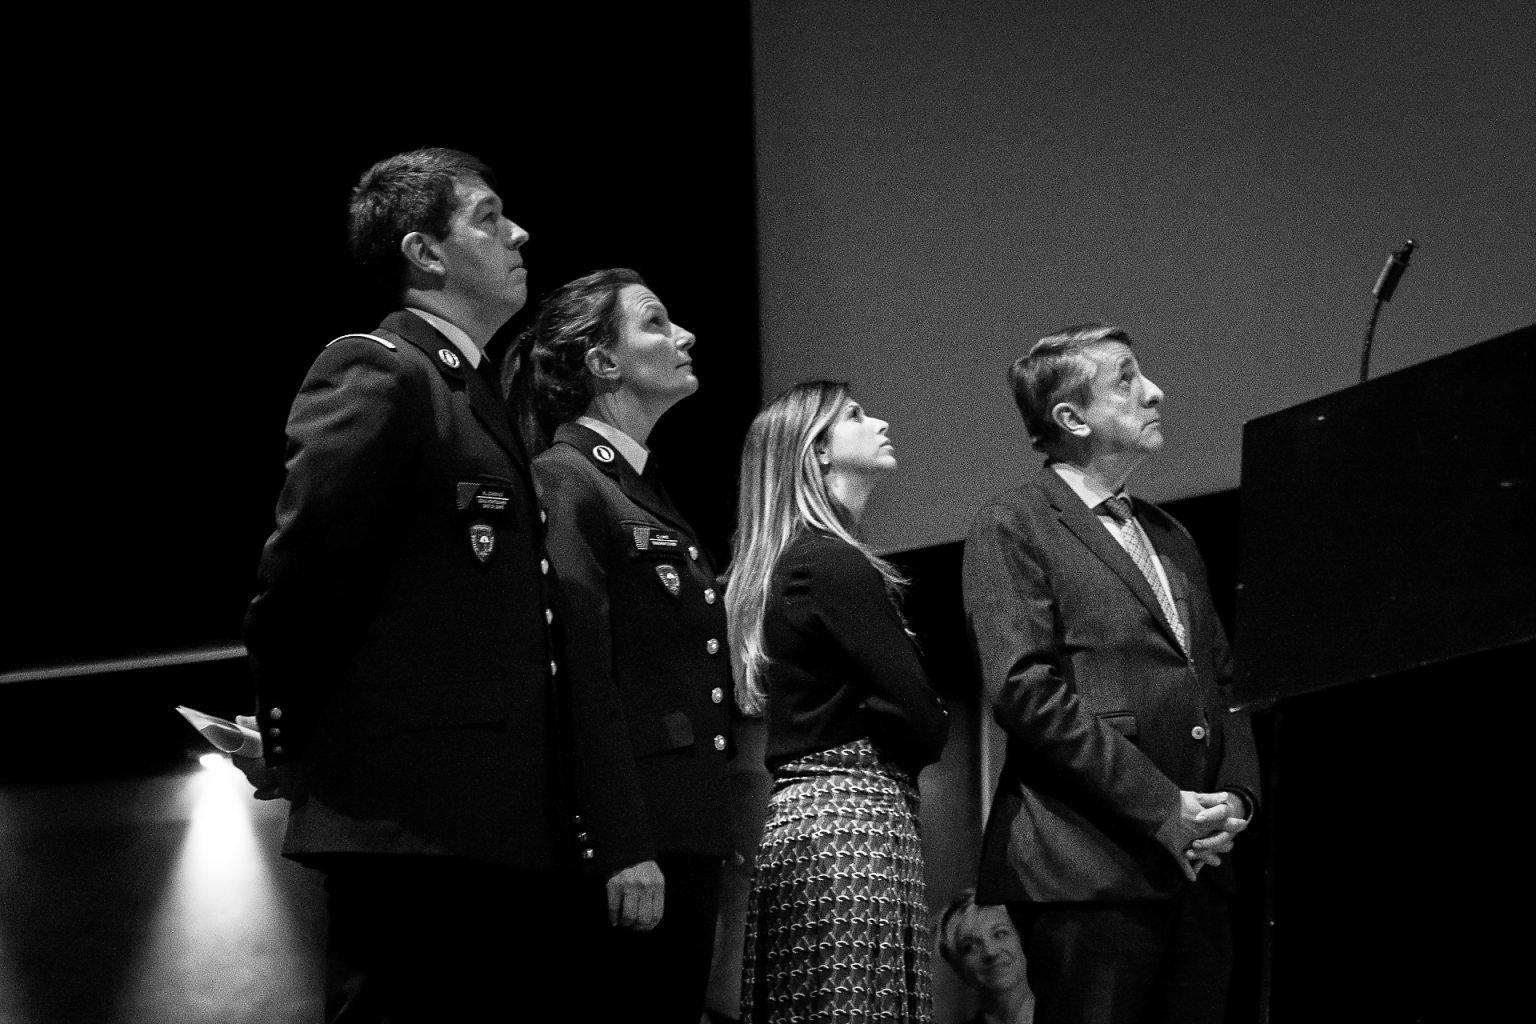 Prix Yansenne 2019, Remise diplômes Brusafe.Brussels 2019 par Aurore Delsoir Photographie